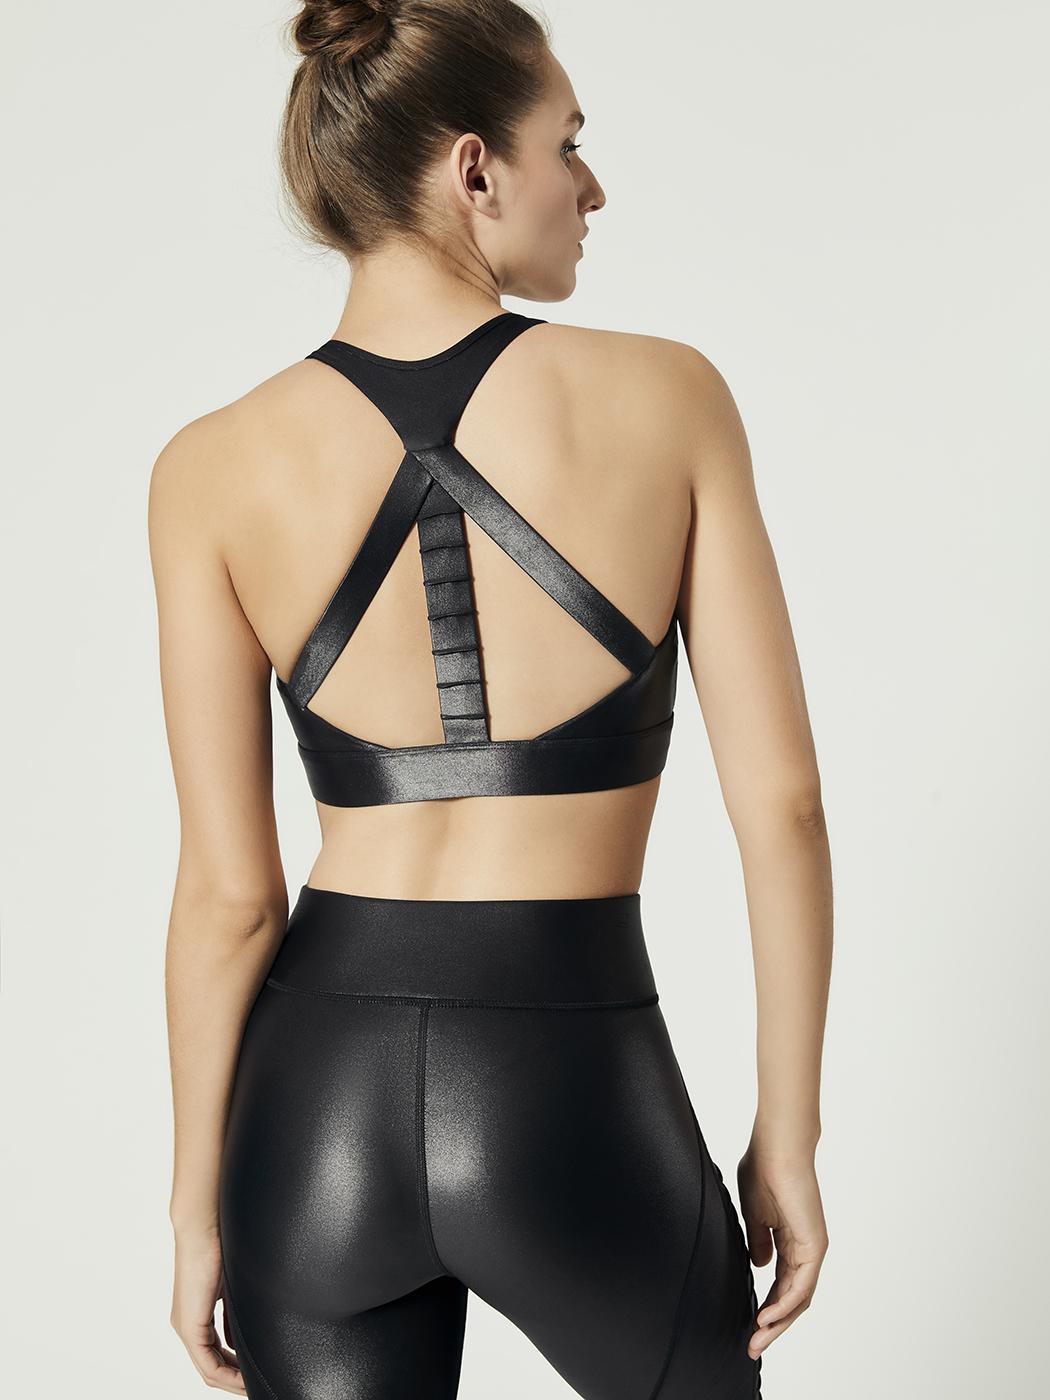 5a494a60 Carbon38 Glossy High Neck Bra - Black - Fashion Activewear Running - Black